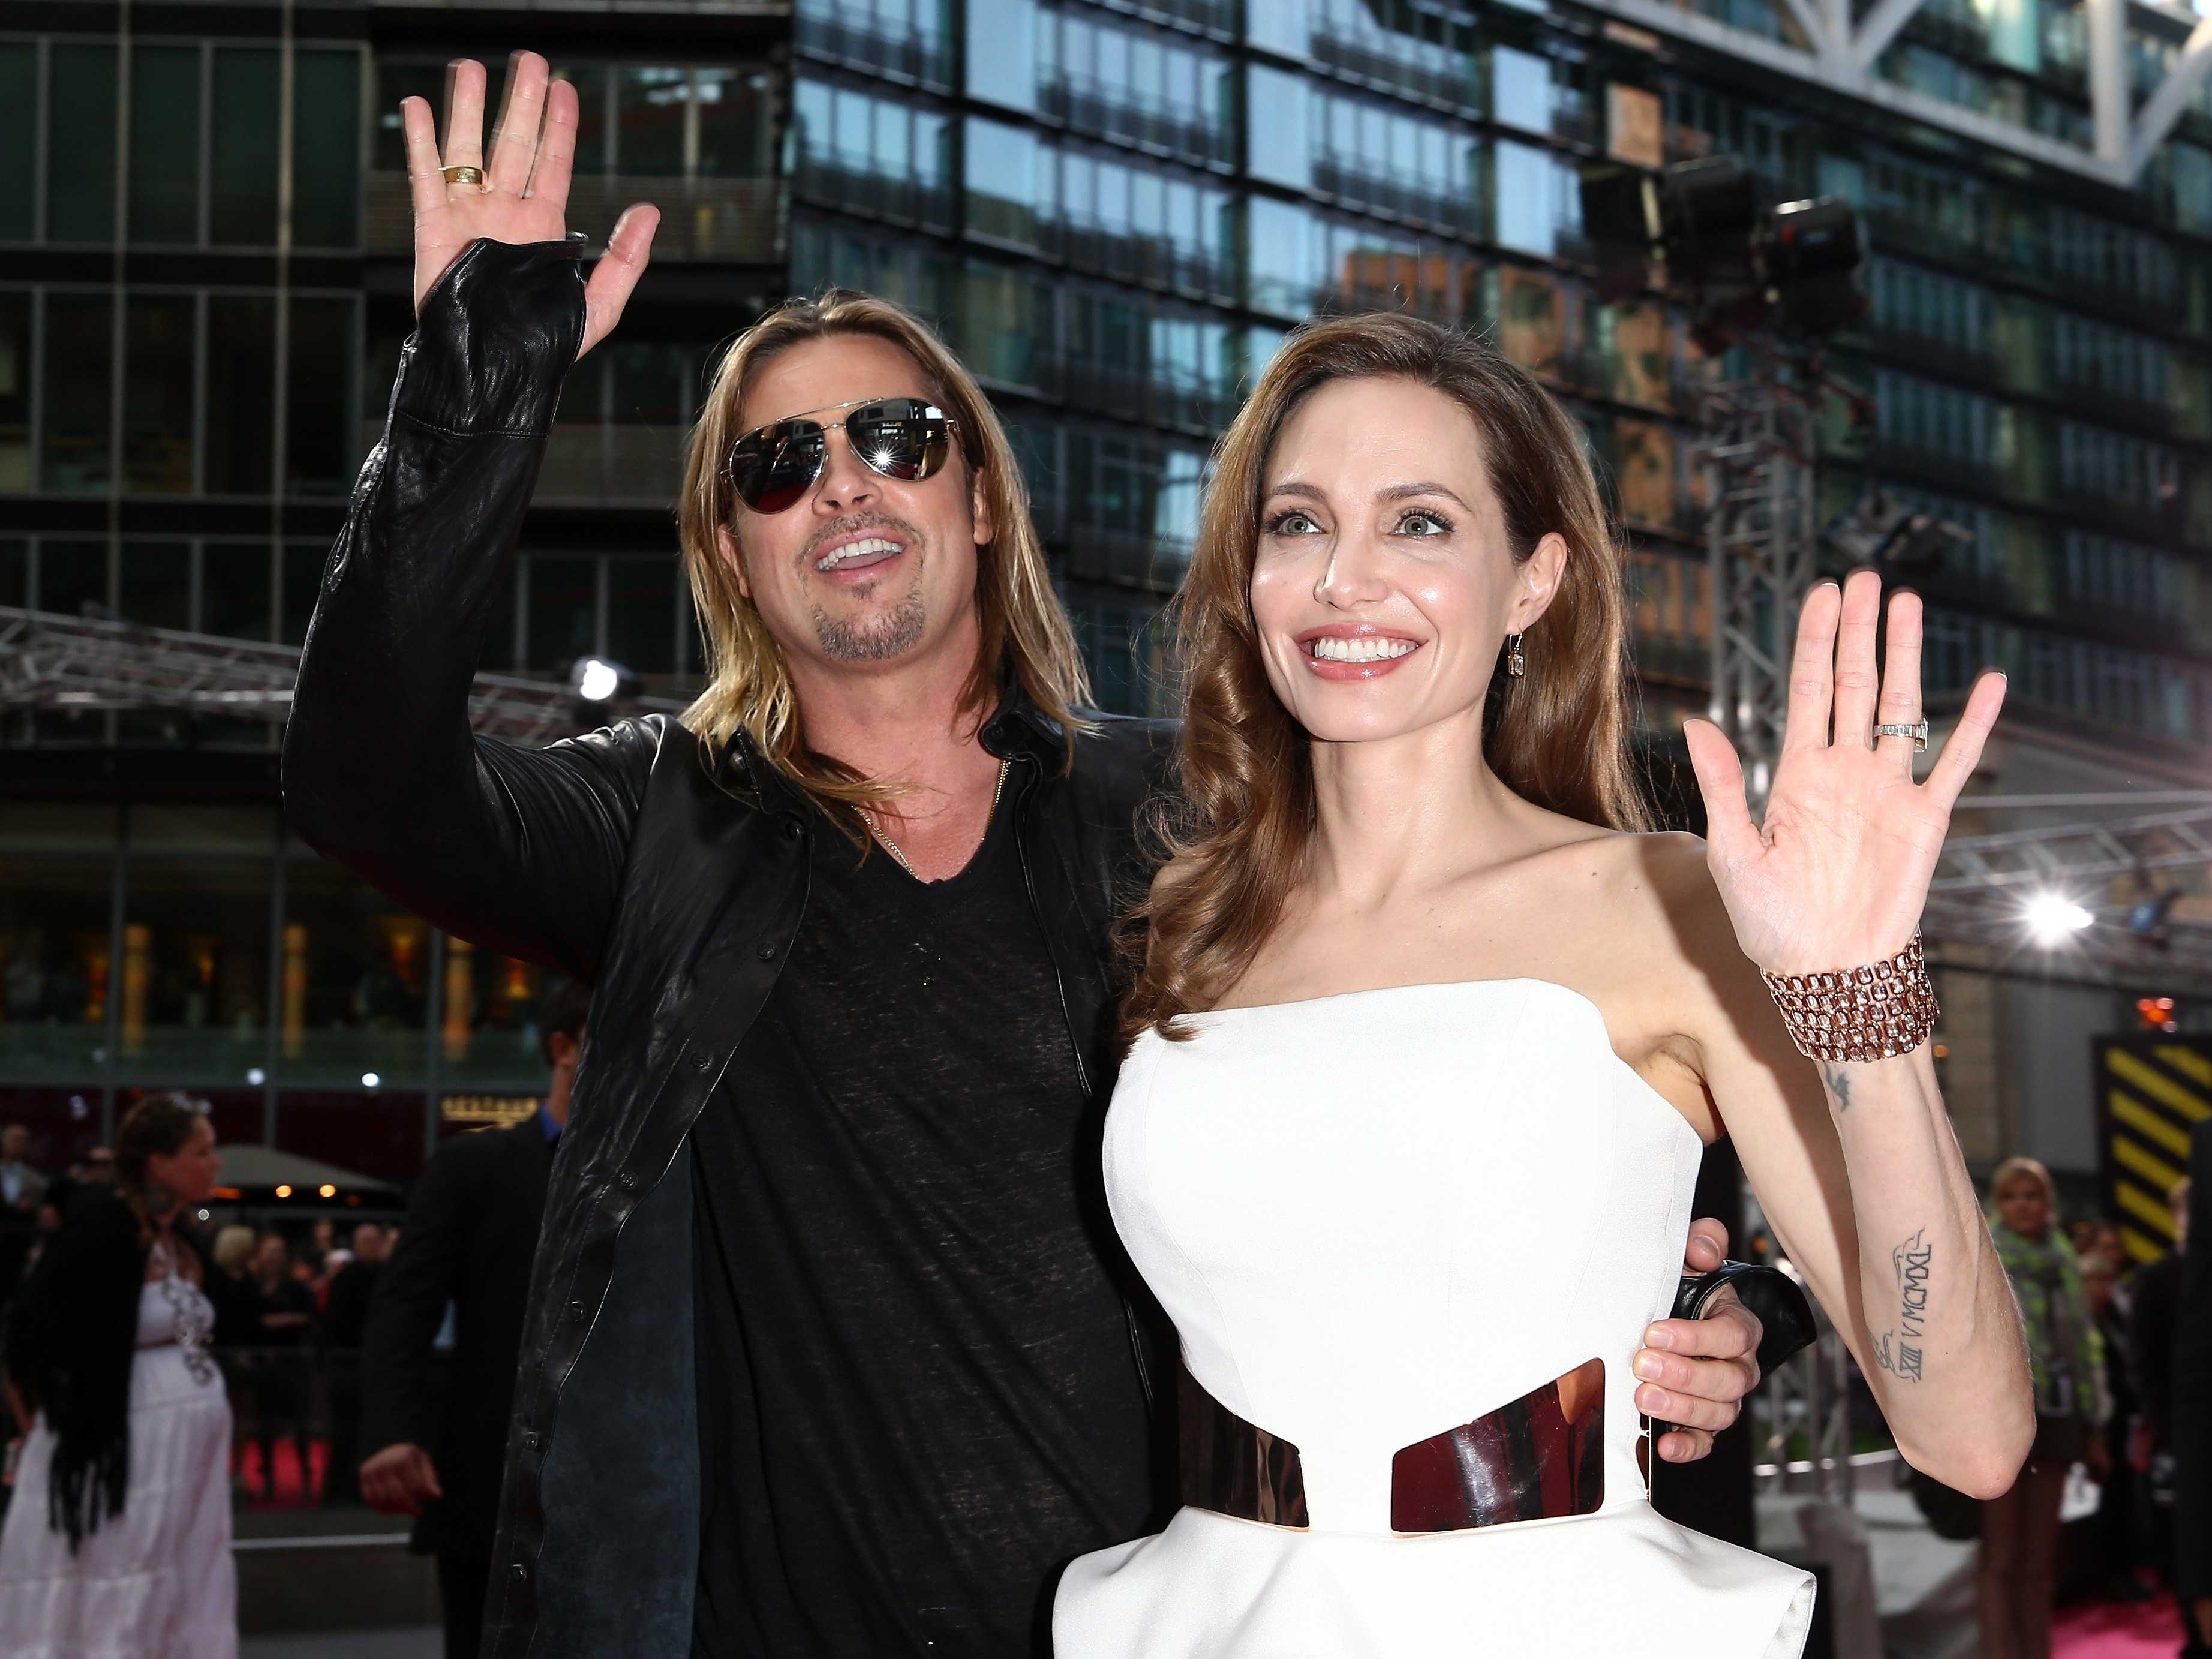 First photos of Angelina Jolie and Brad Pitt's wedding emerge